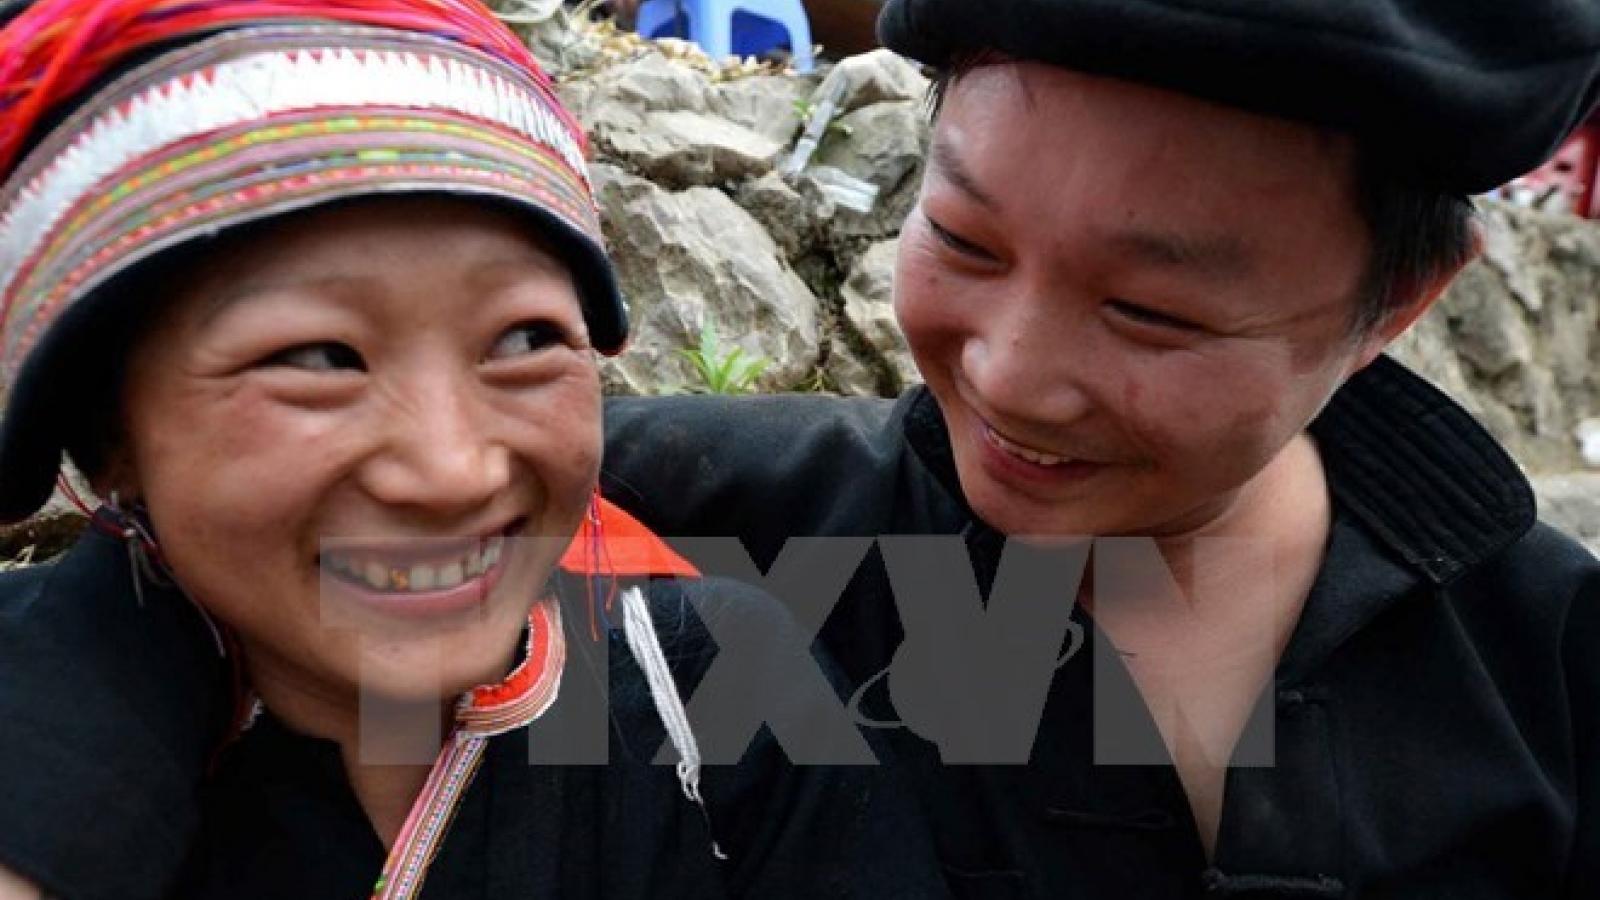 Khau Vai love market festival to take place in Ha Giang